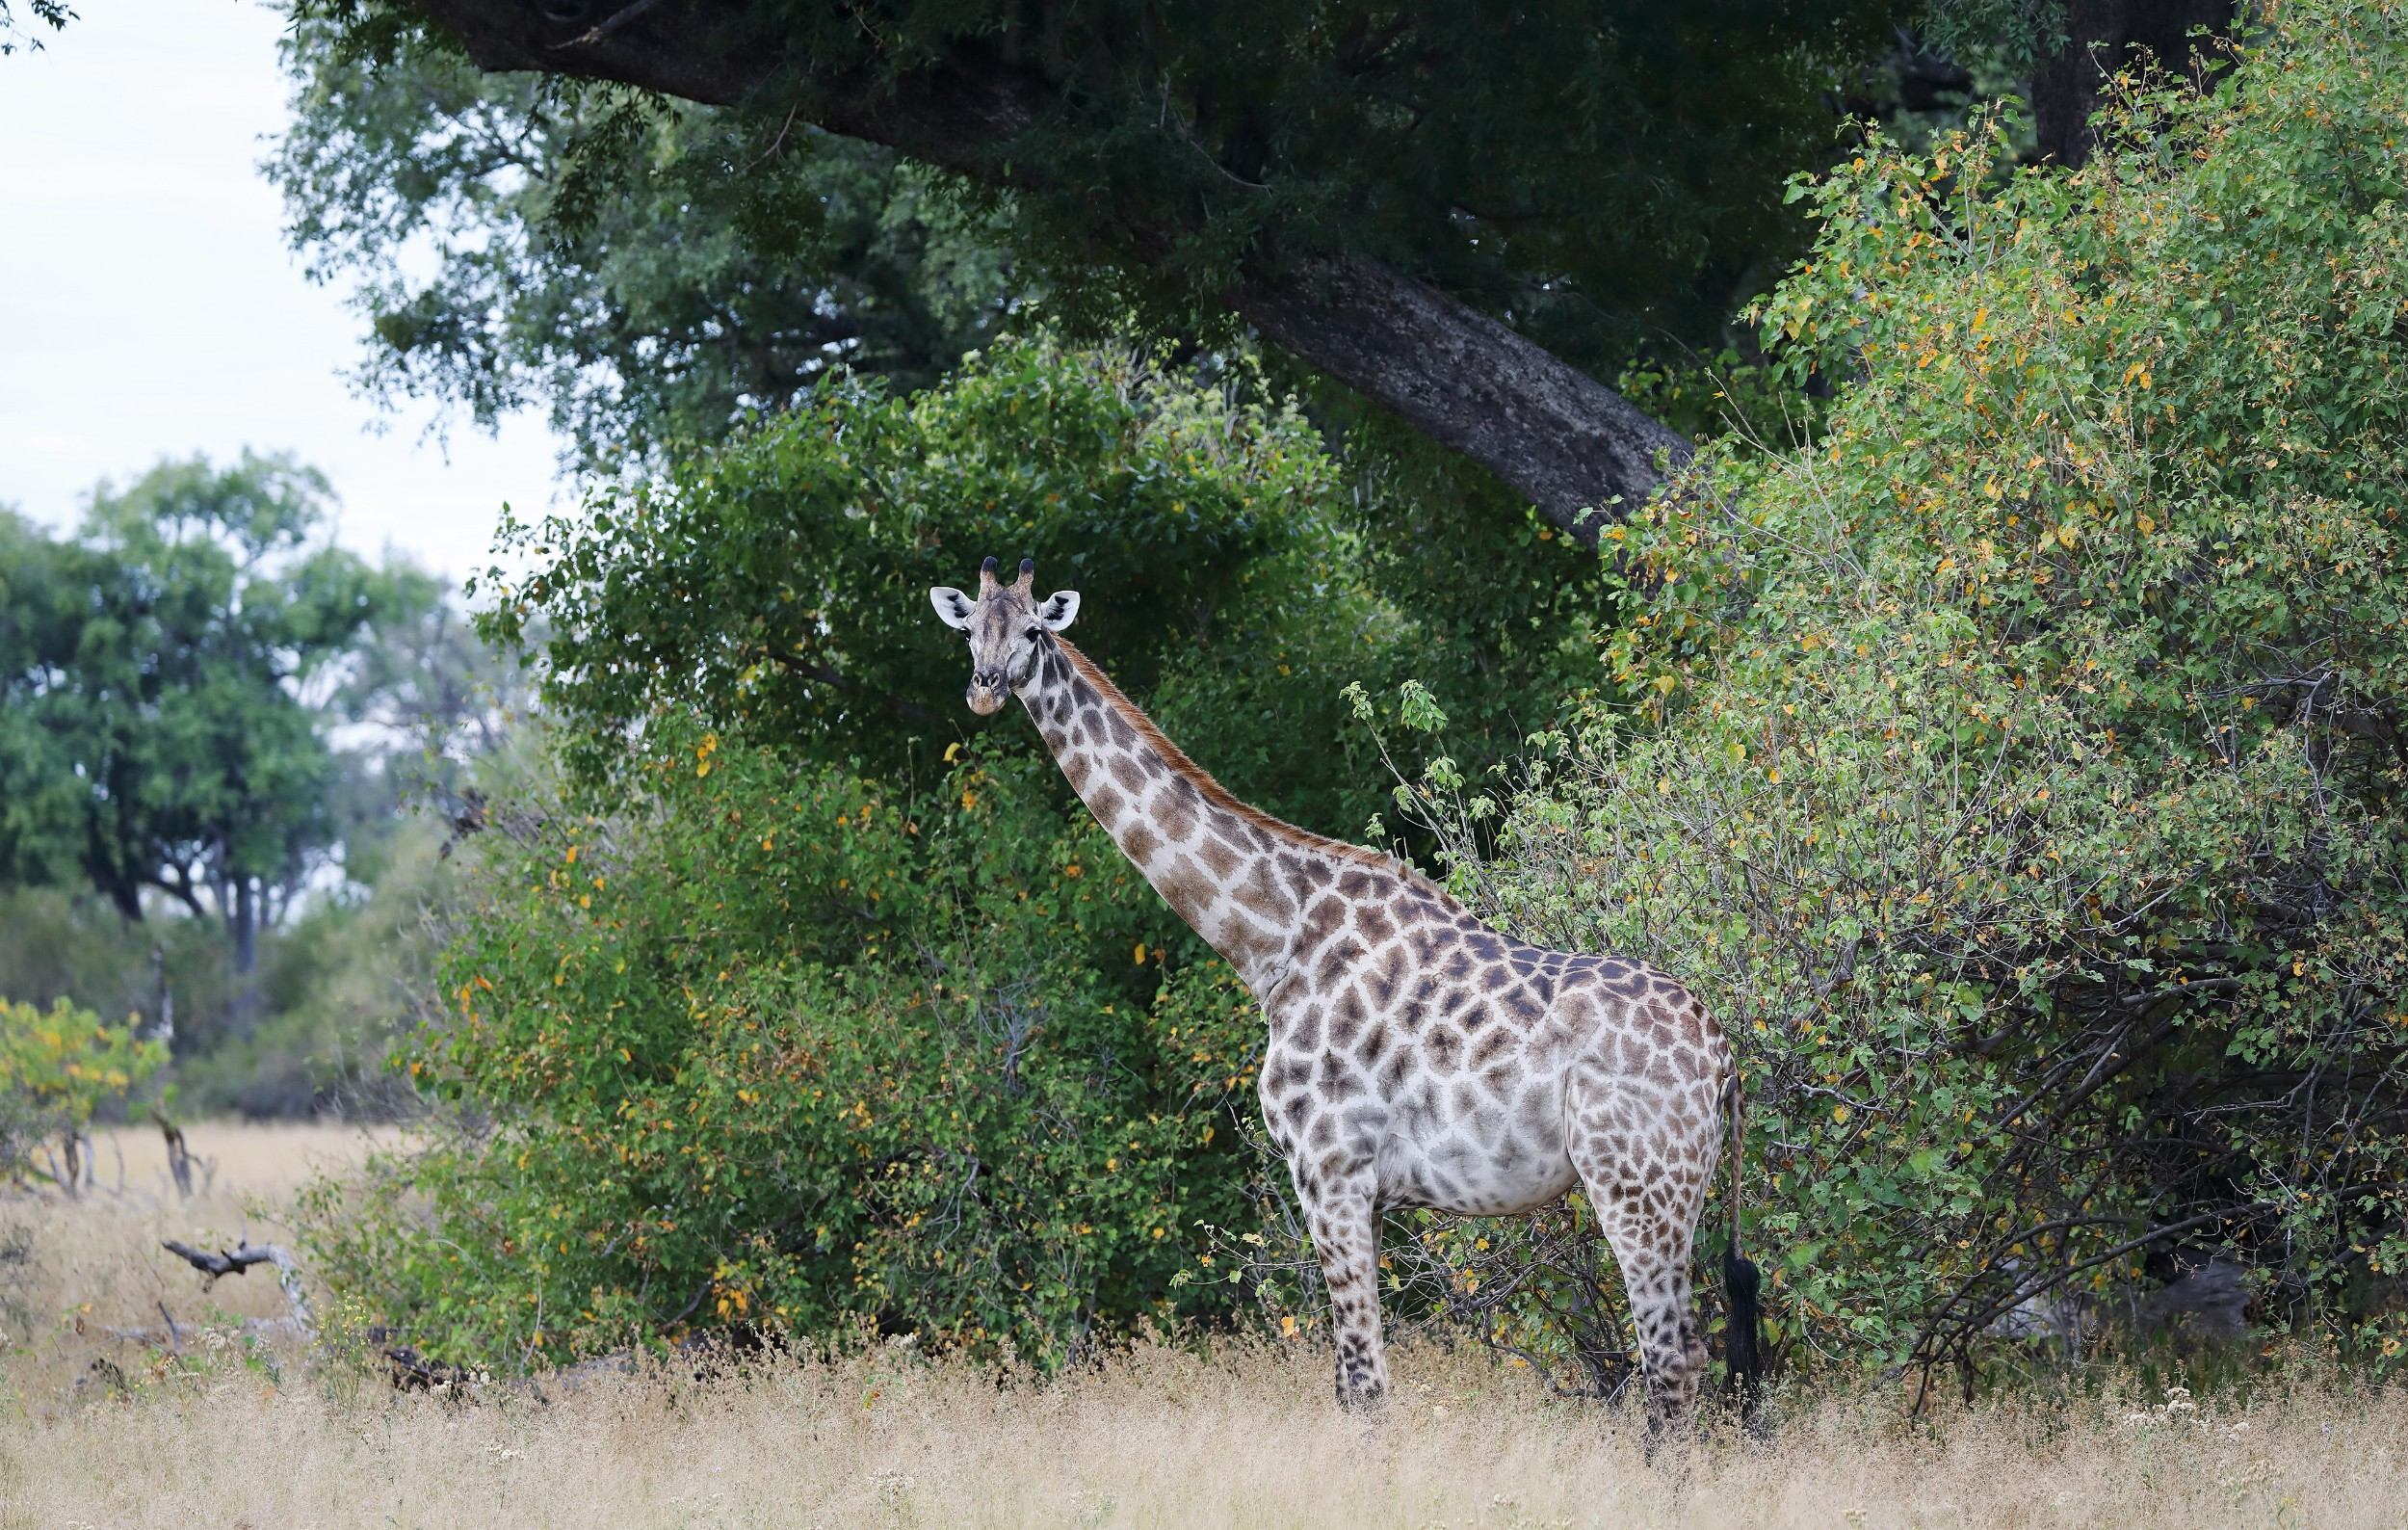 21The Jackal and Hide - Giraffe in the bush.jpg